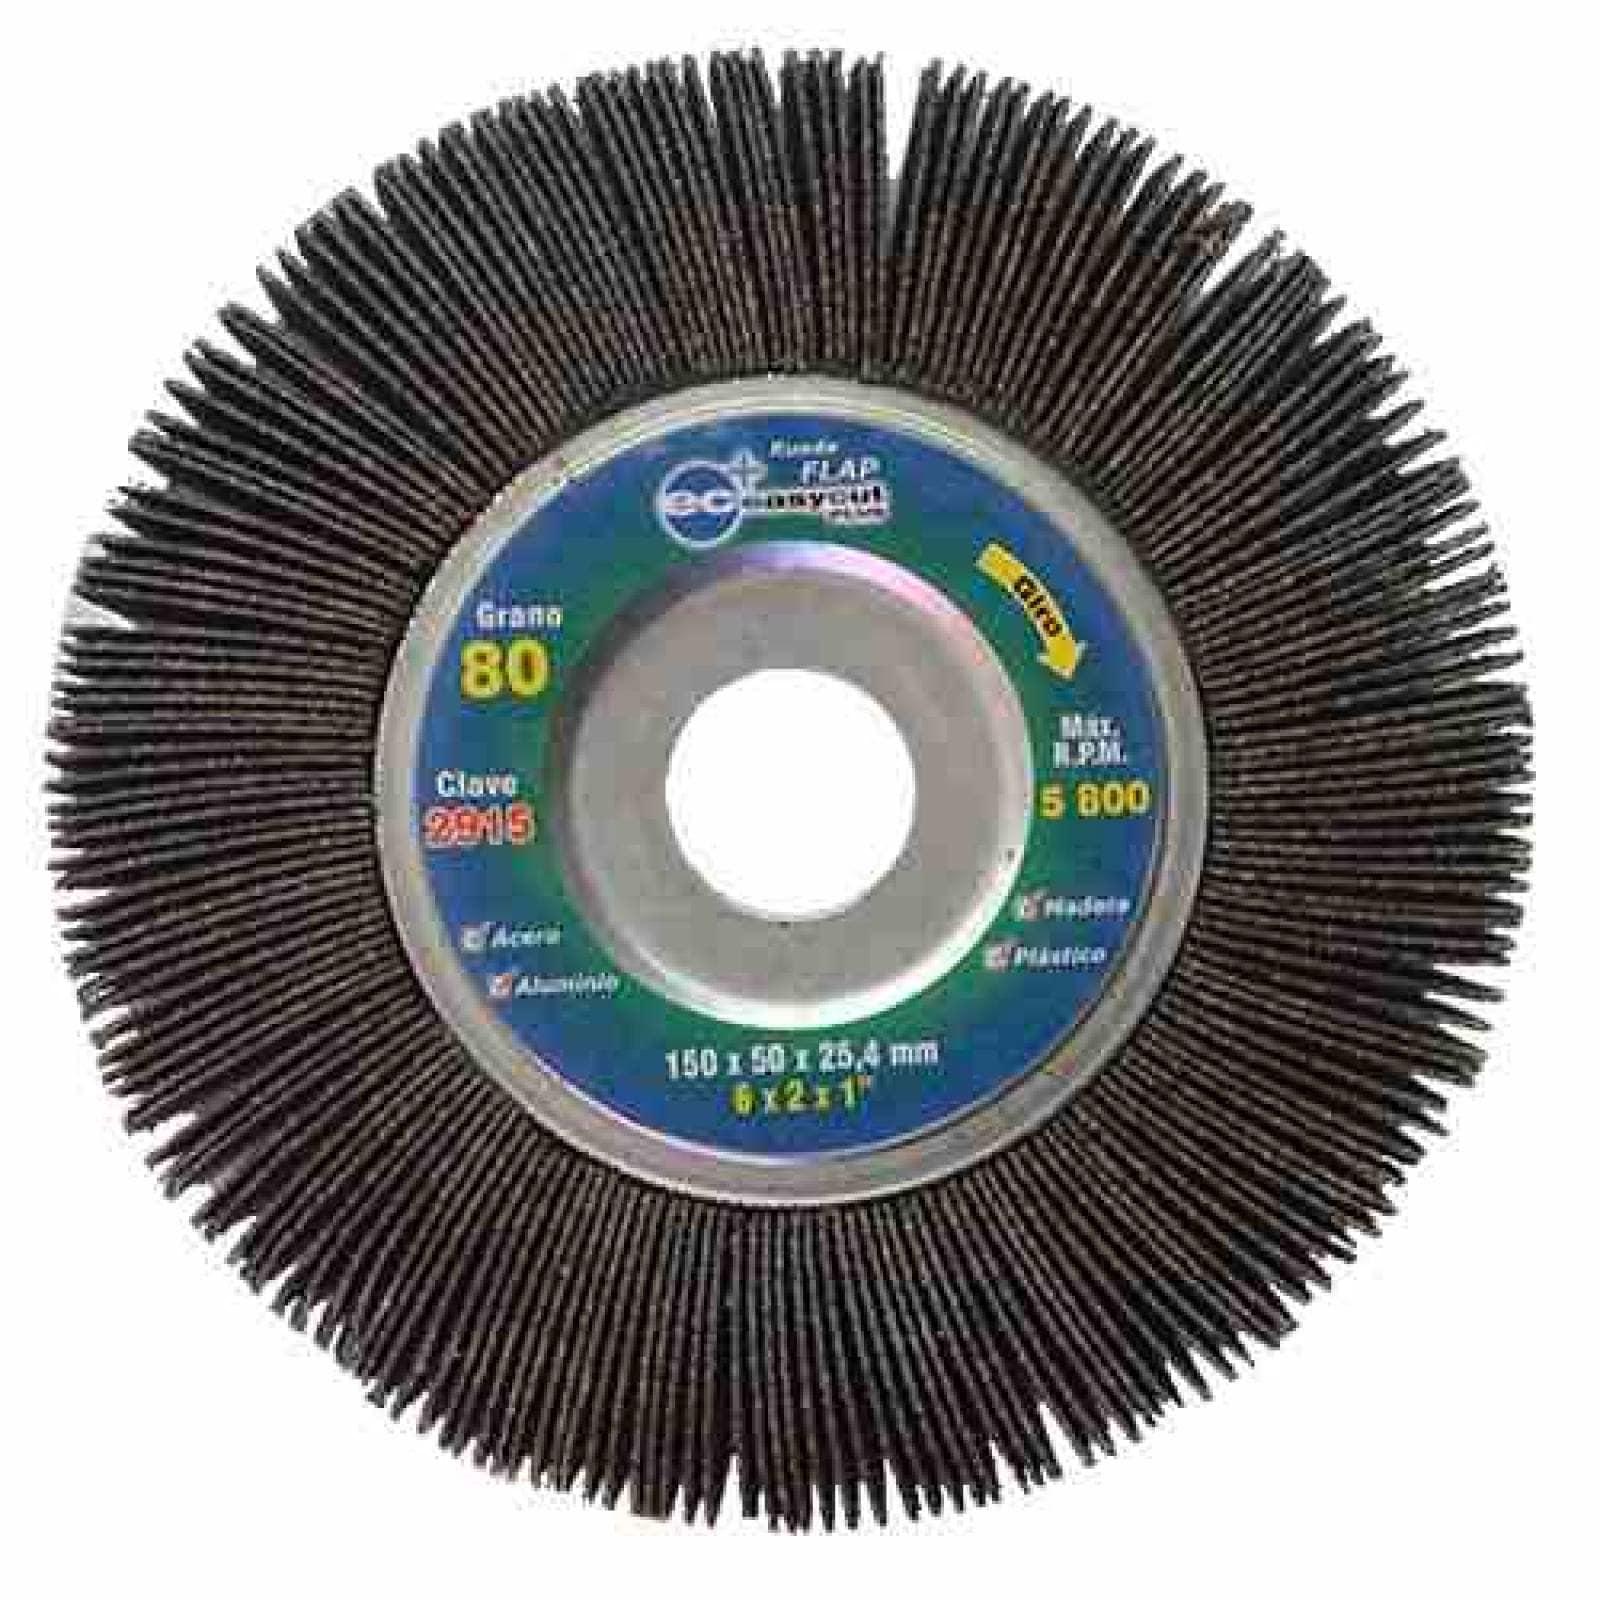 Lija Esmeril Flap Easy-Cut Plus Grano 80 2915 Acc Austromex